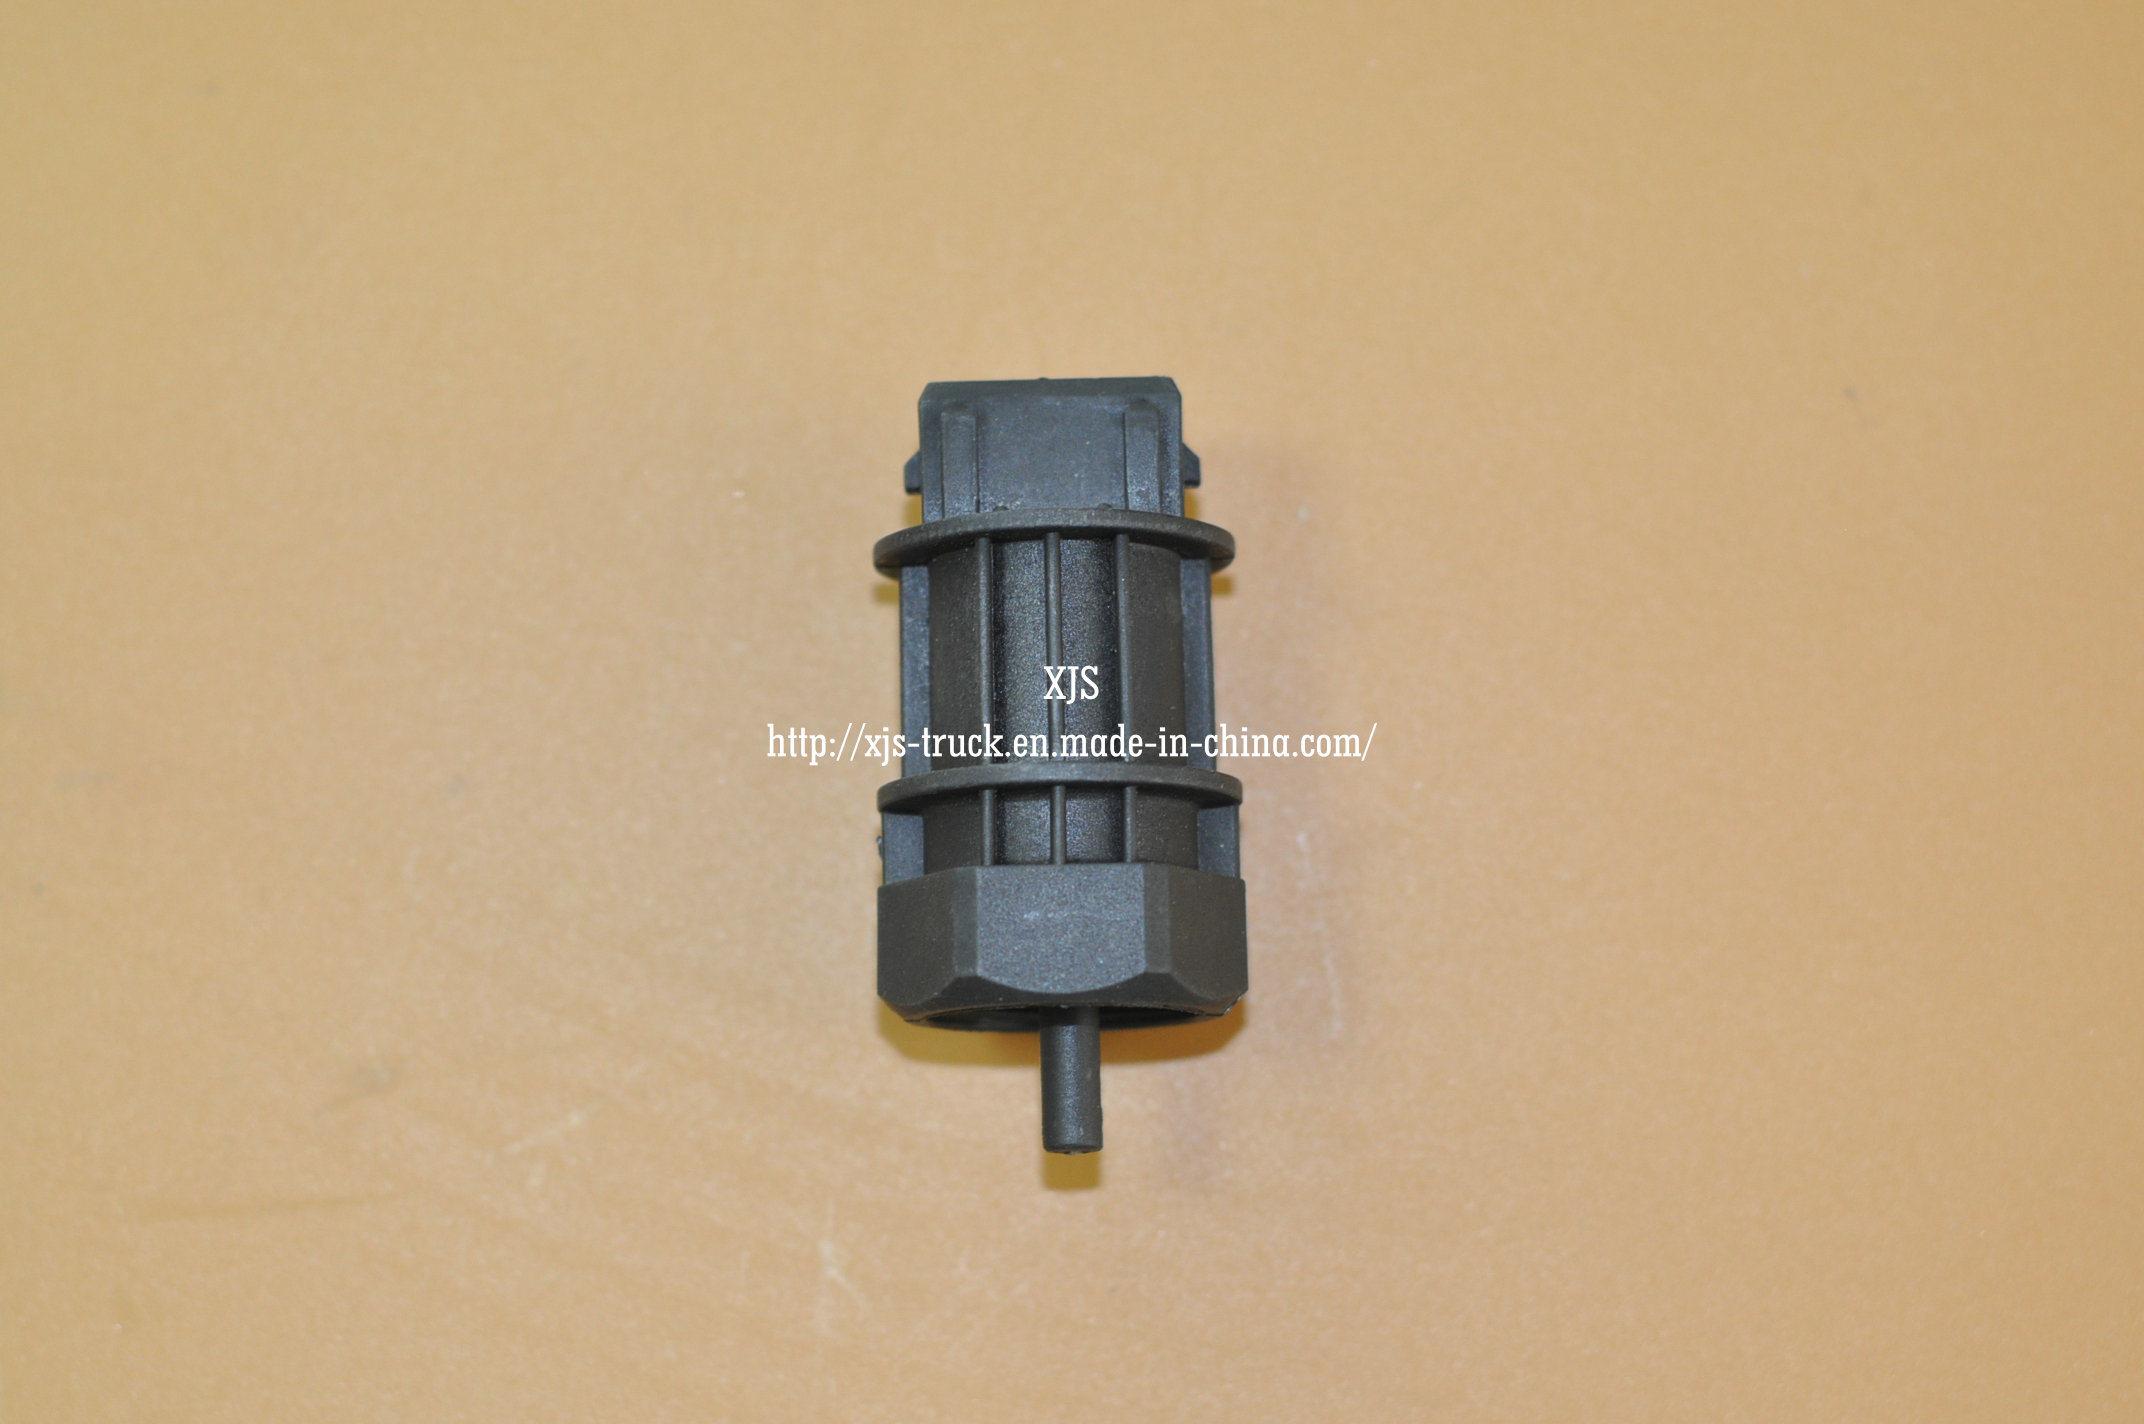 Great Wall Winlge 3 Cc1031PS62 Speed Sensor 3802100 K00-B Acjsde